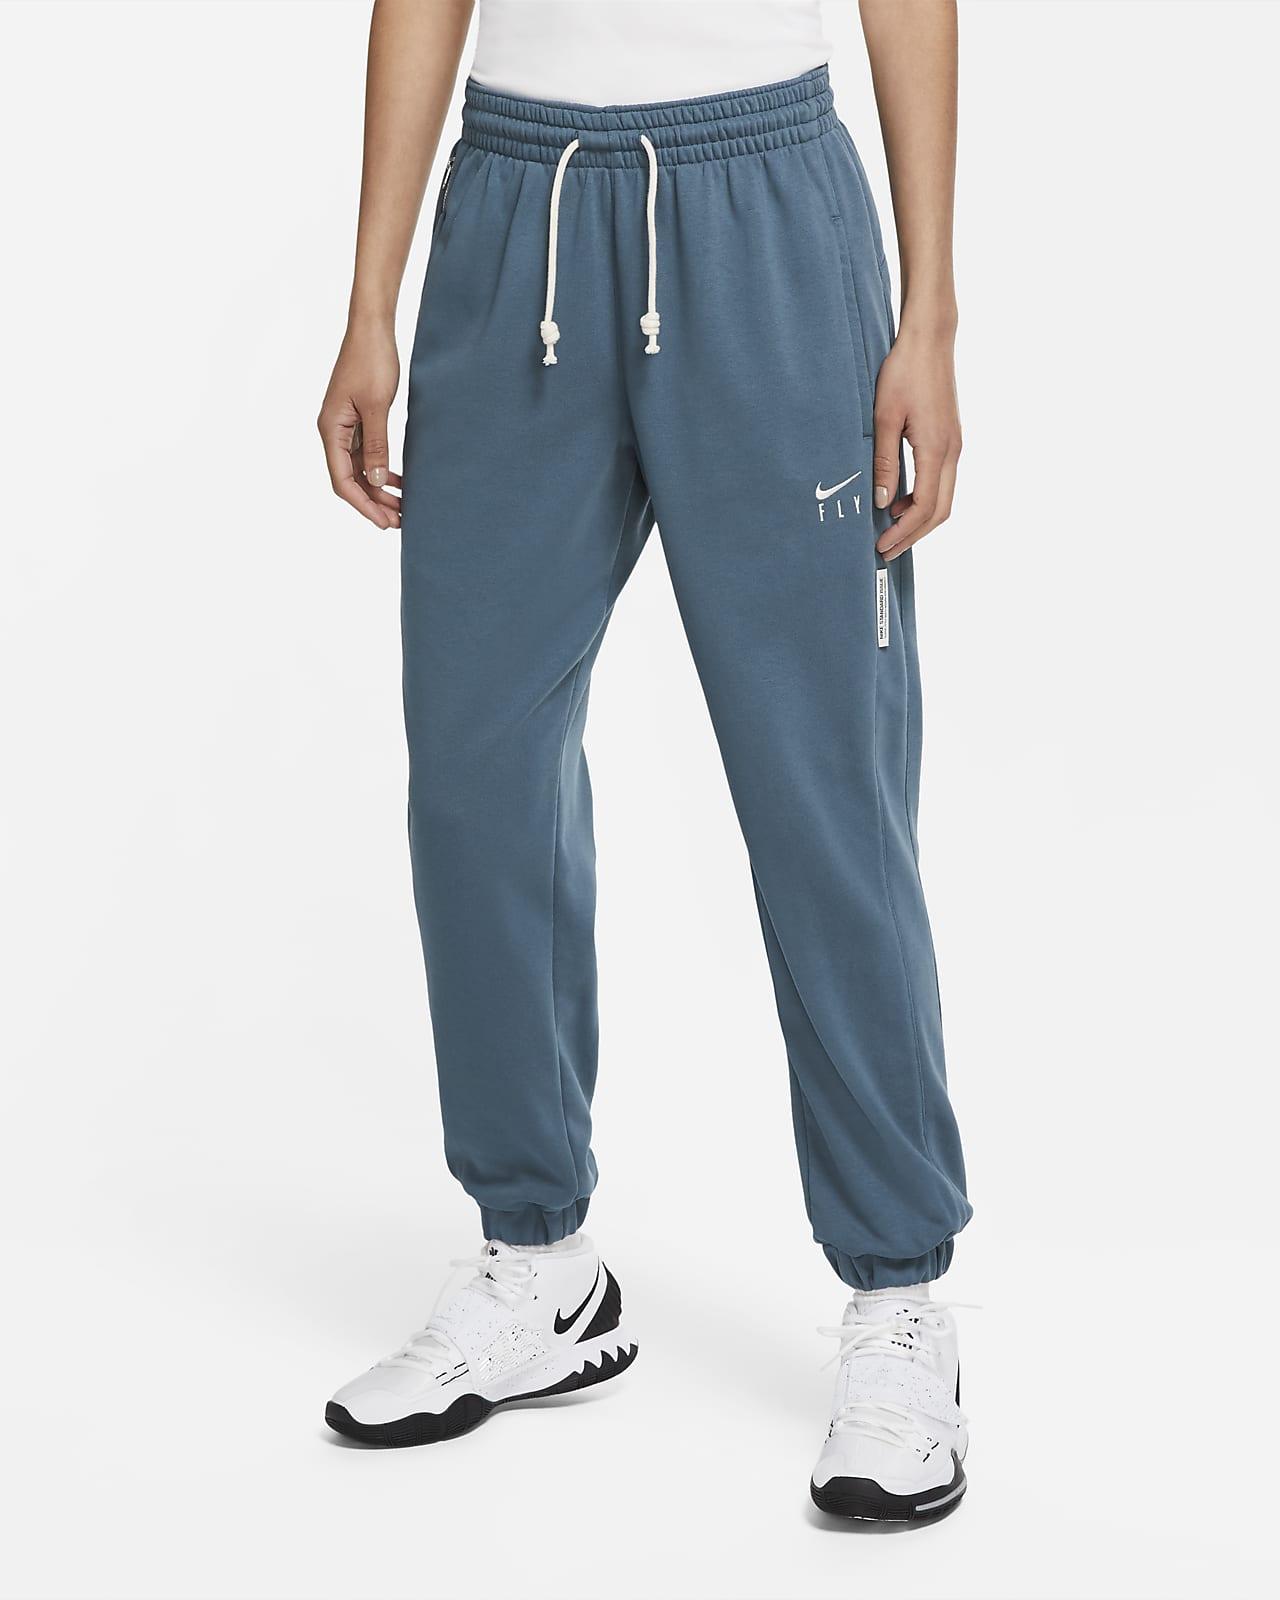 Nike Swoosh Fly Standard Issue Basketbalbroek voor dames